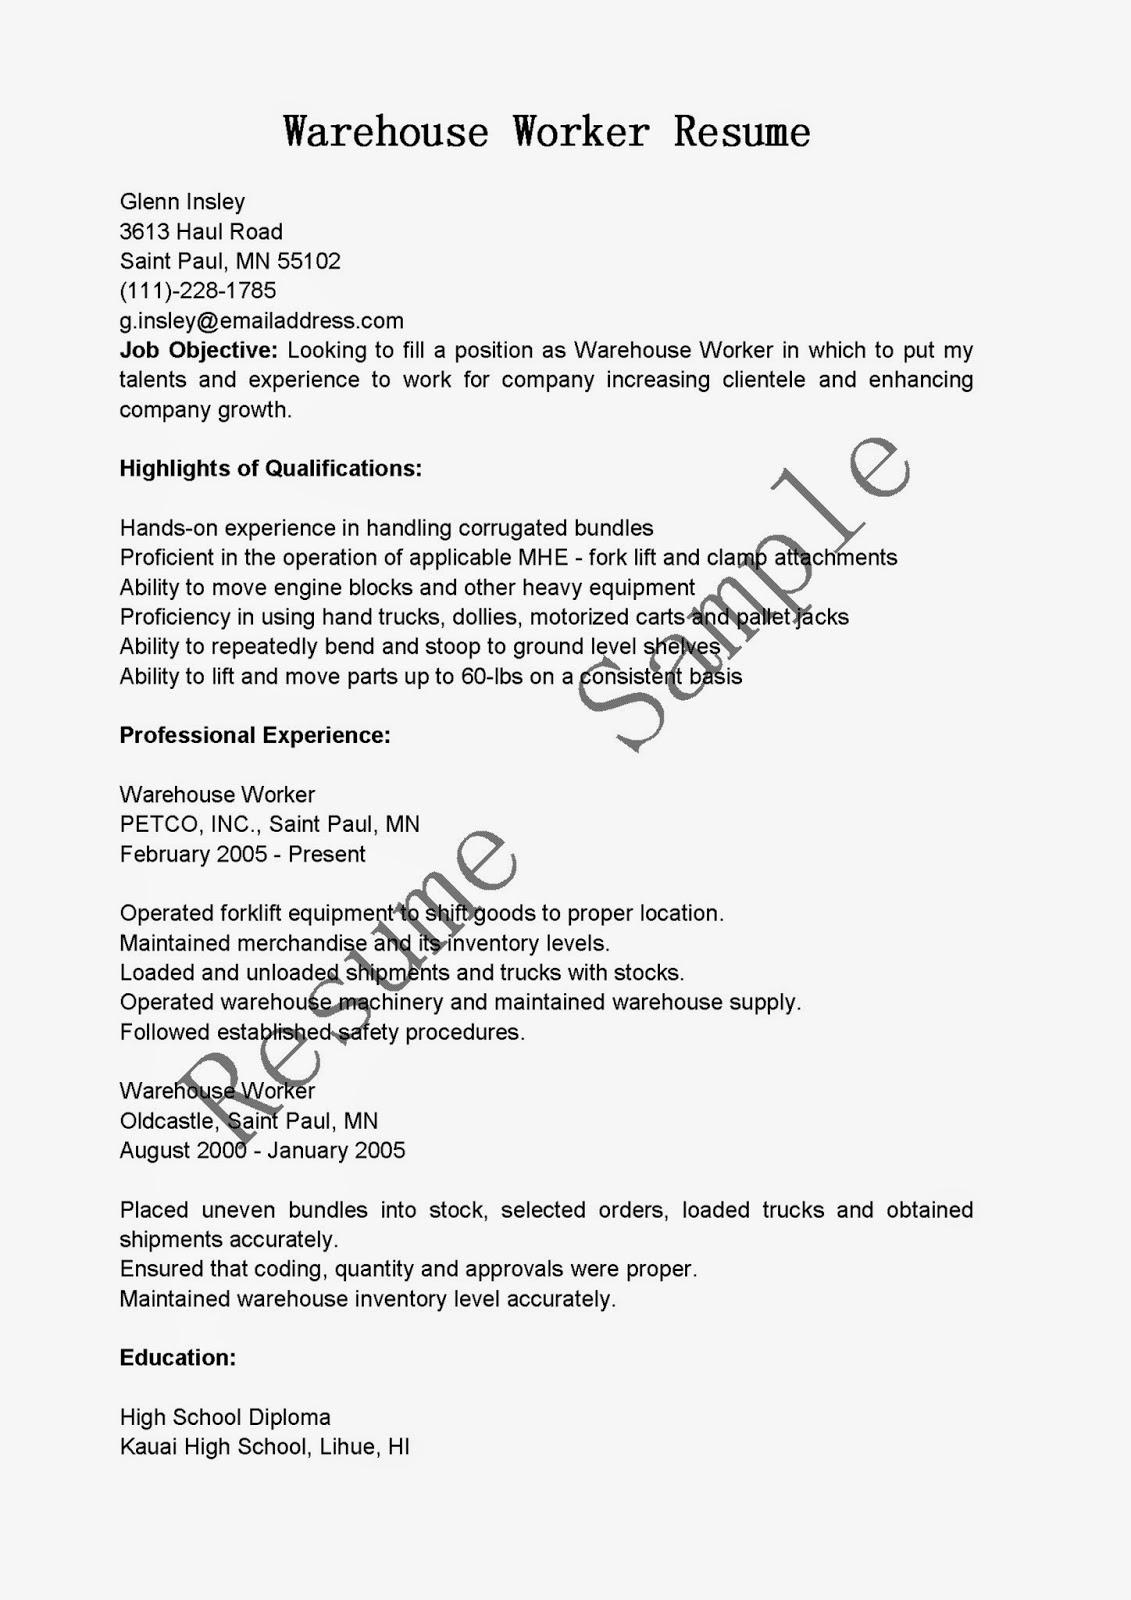 resume samples  warehouse worker resume sample